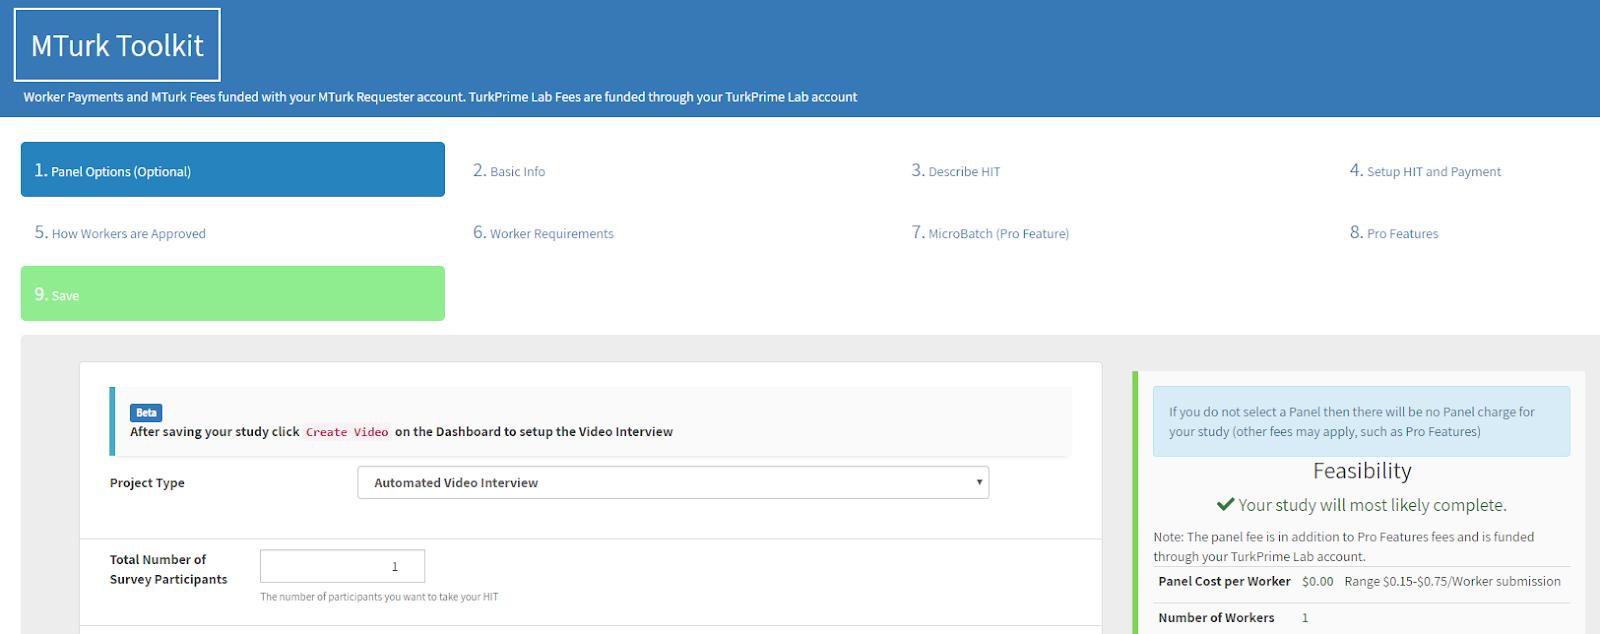 TurkPrime MTurk Toolkit setup page